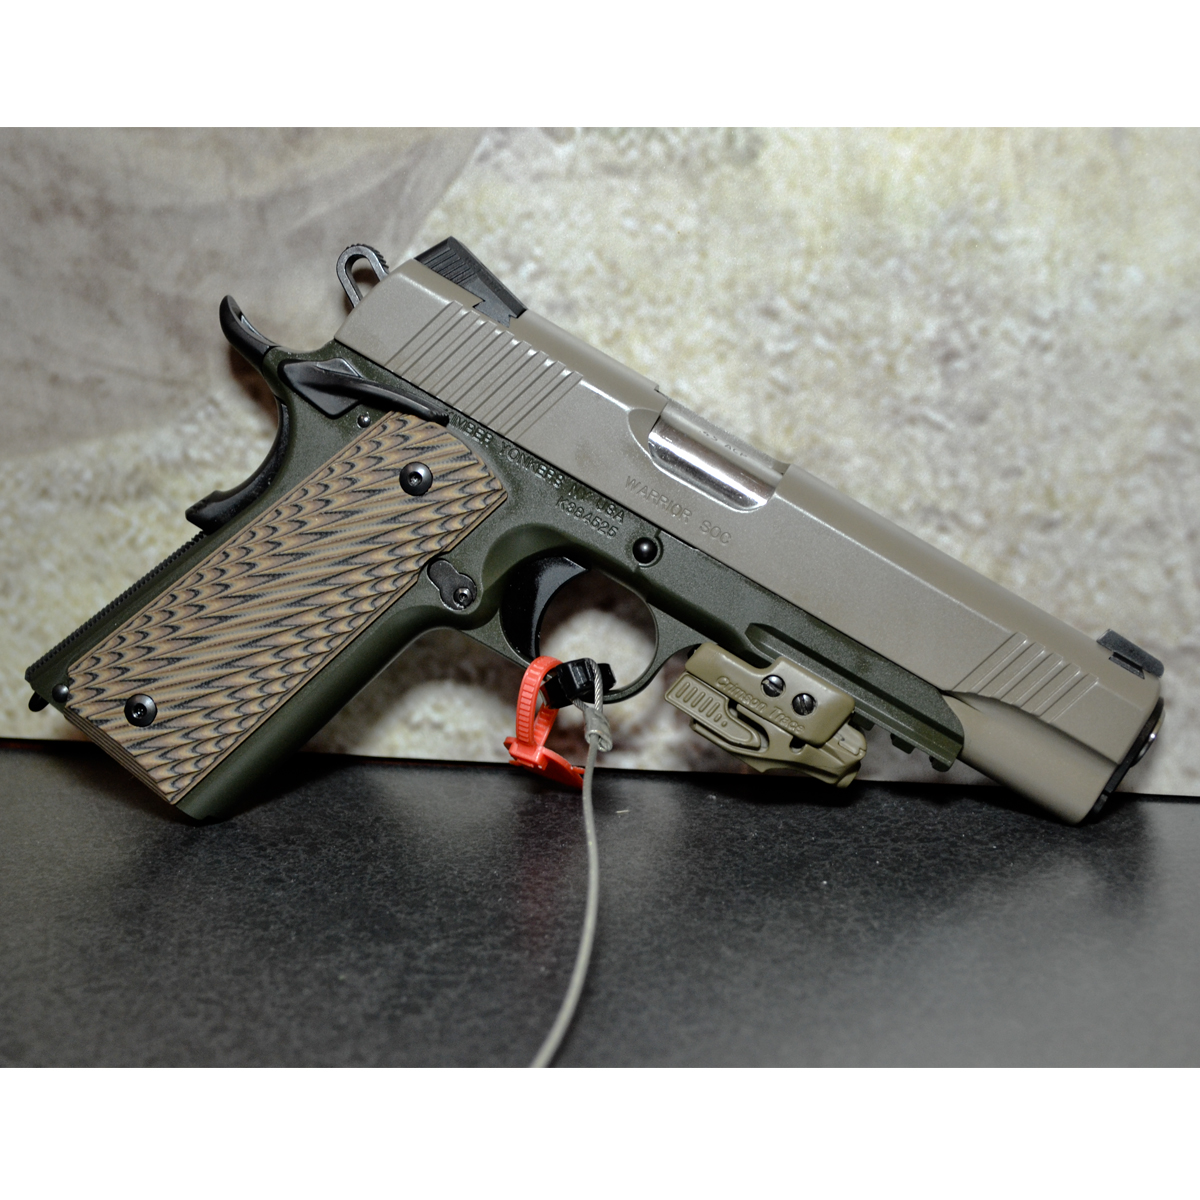 1200x1200 > Kimber Pistol Wallpapers